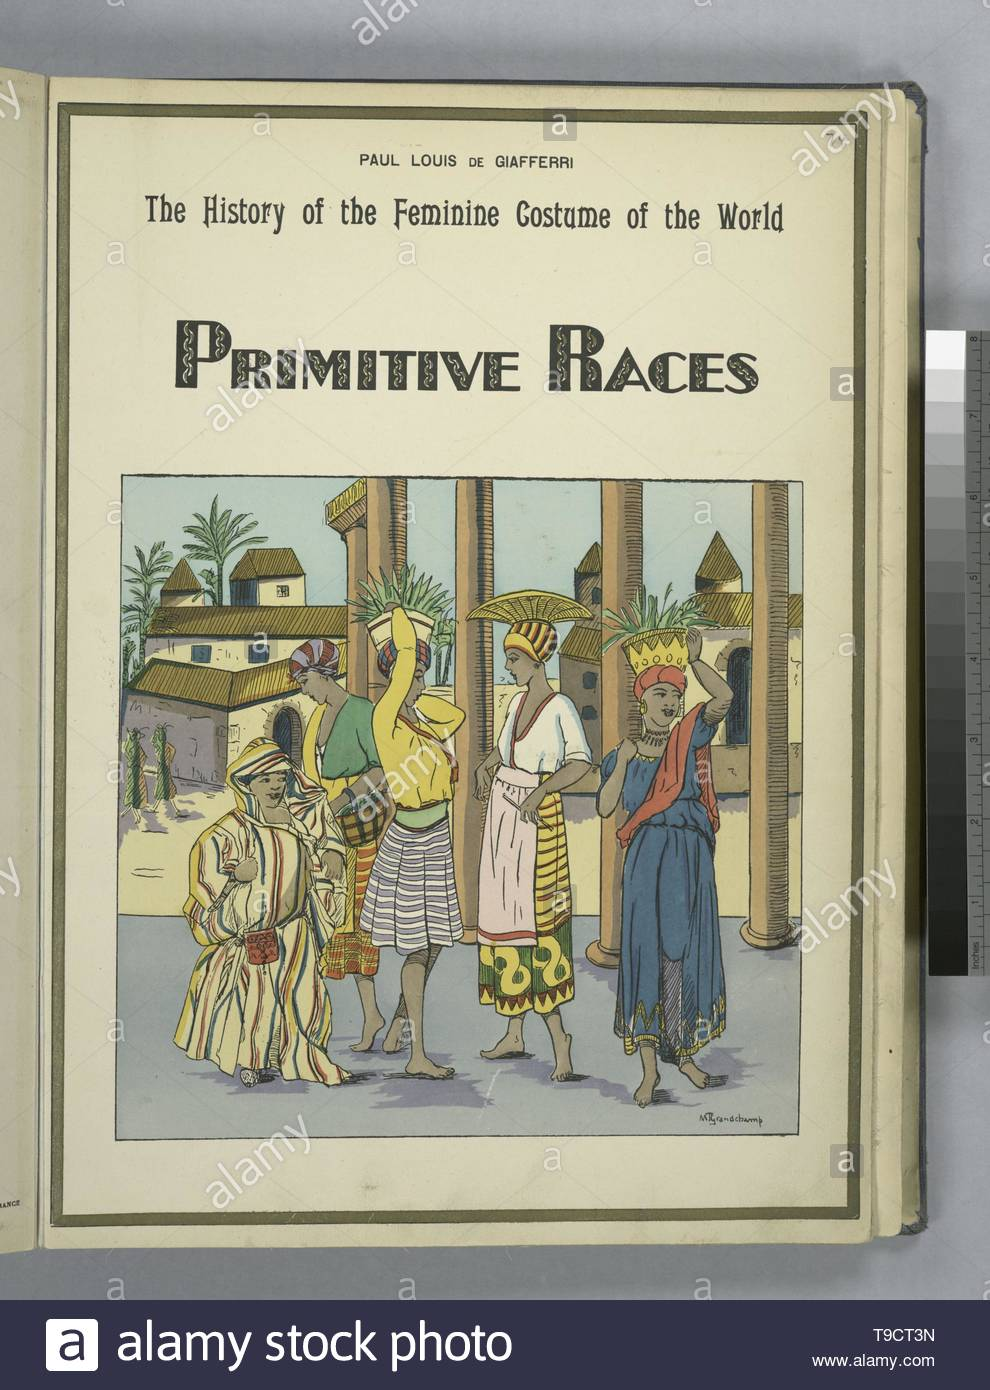 Giafferri,PaulLouisde,b 1886-The history of the feminine costume of the world  Primitive races - Stock Image